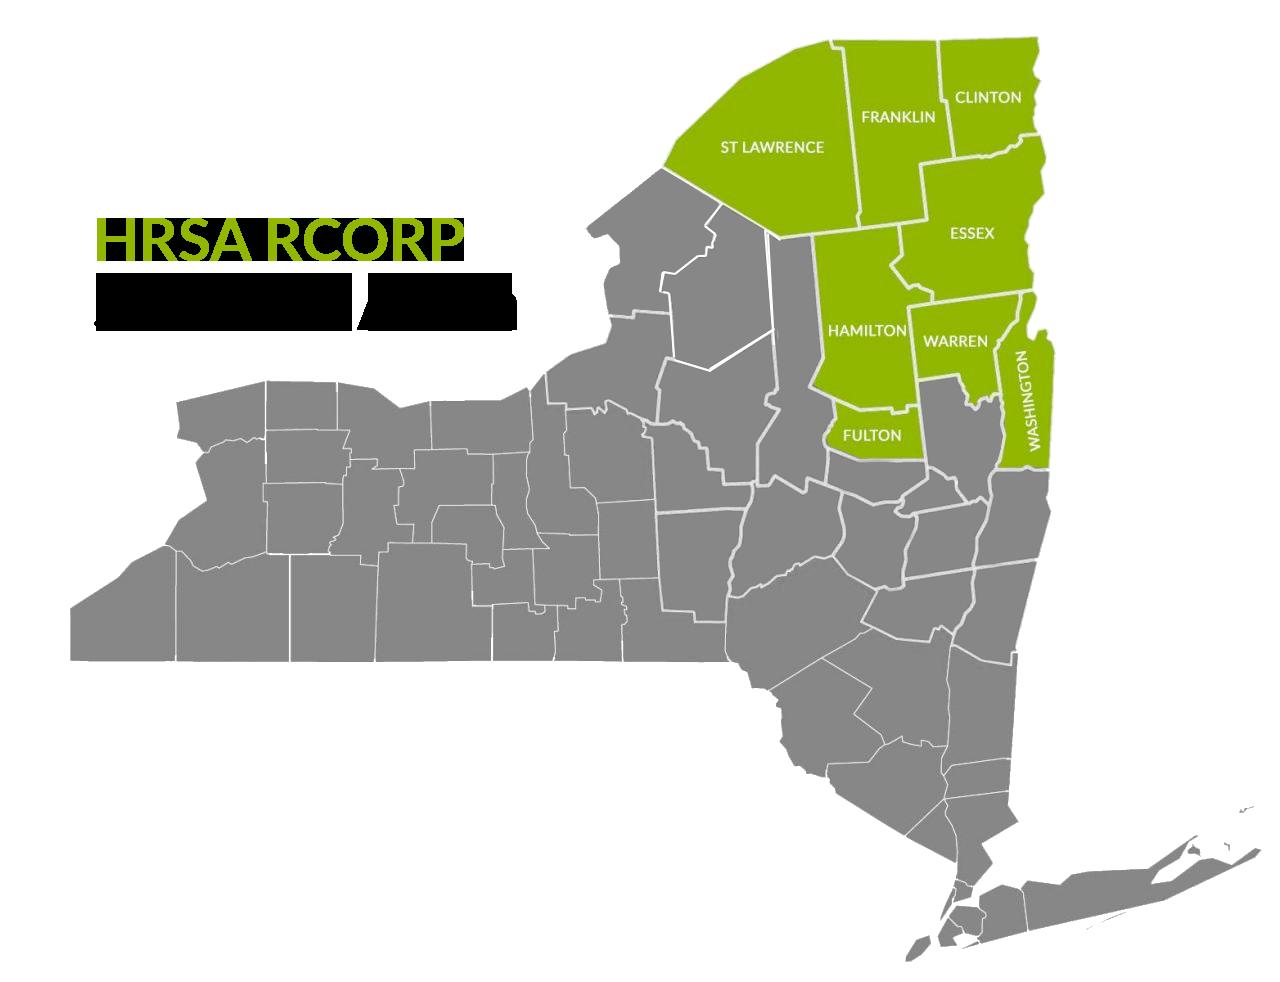 HRSA RCORP Service Area